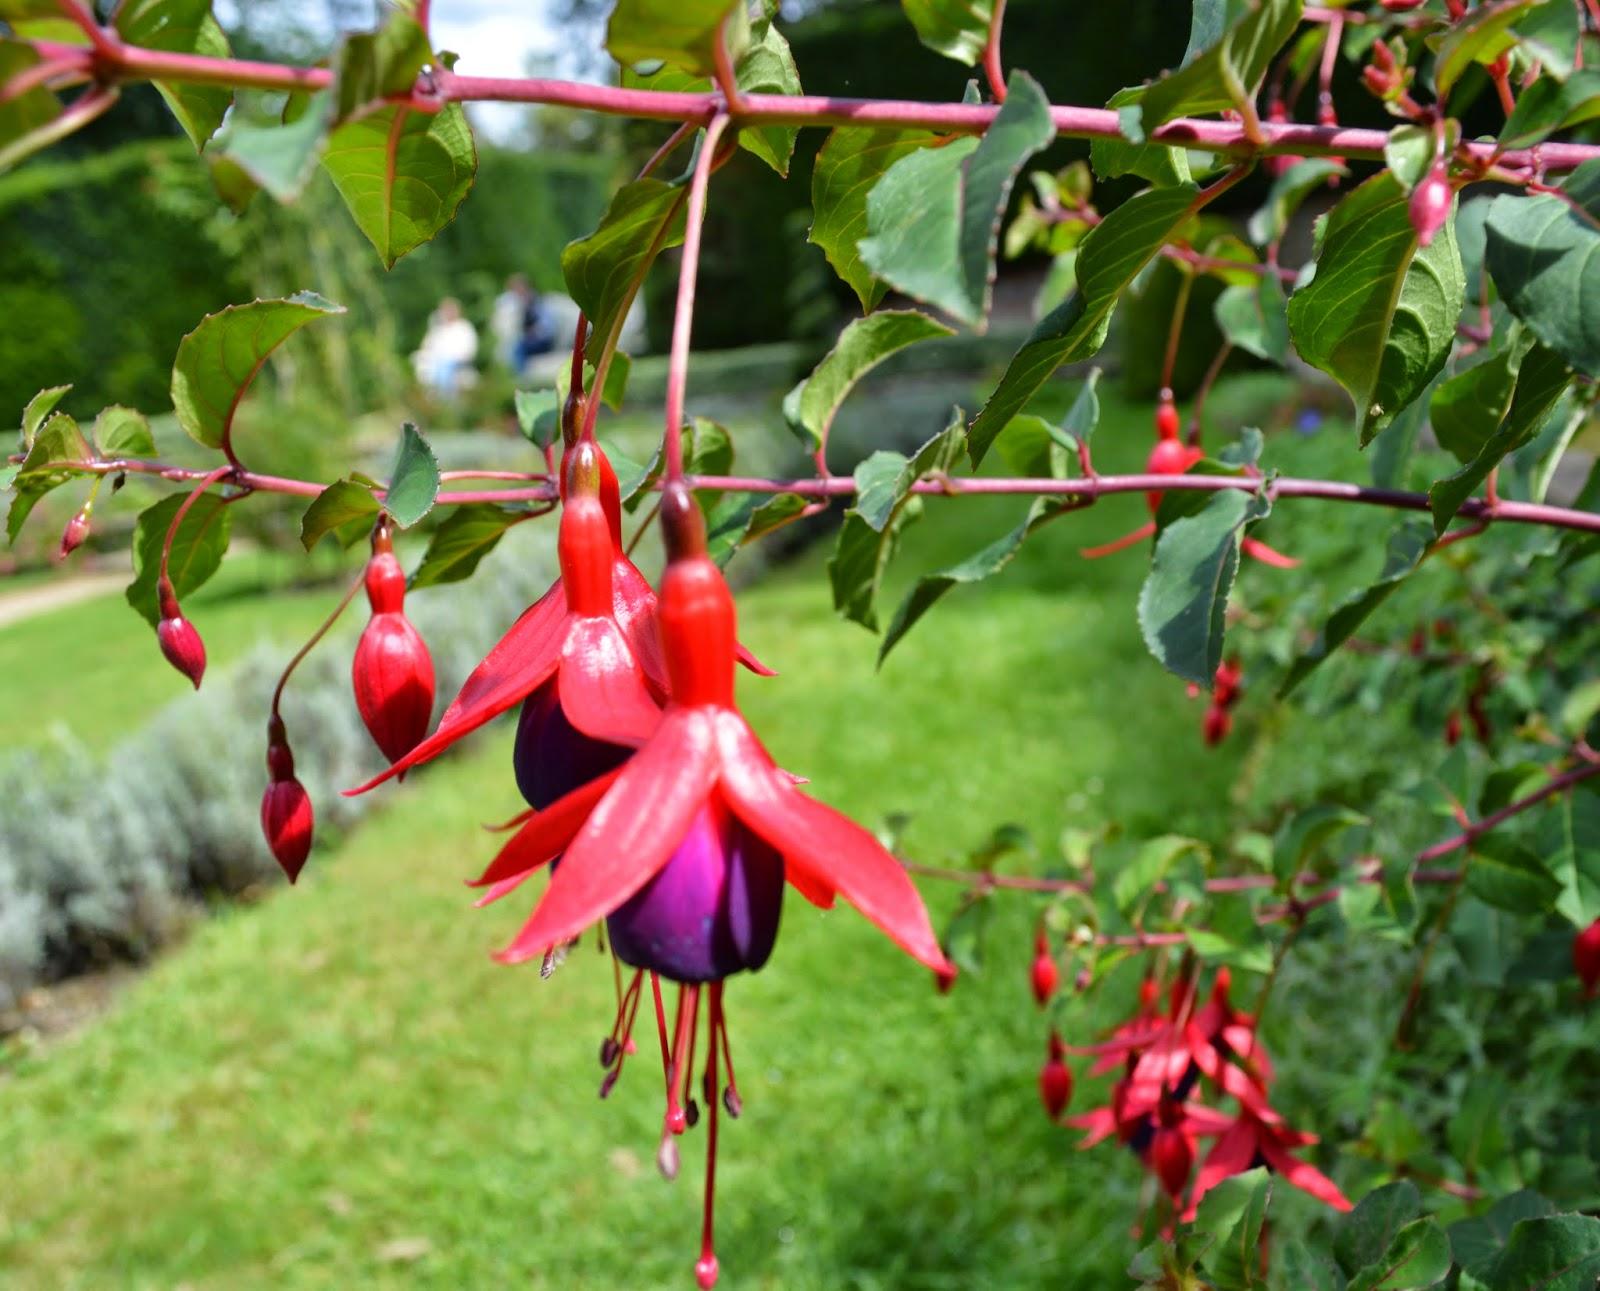 flowers, garden, Fushsias, pretty, pink purple, photo, photography, colourful, grass,